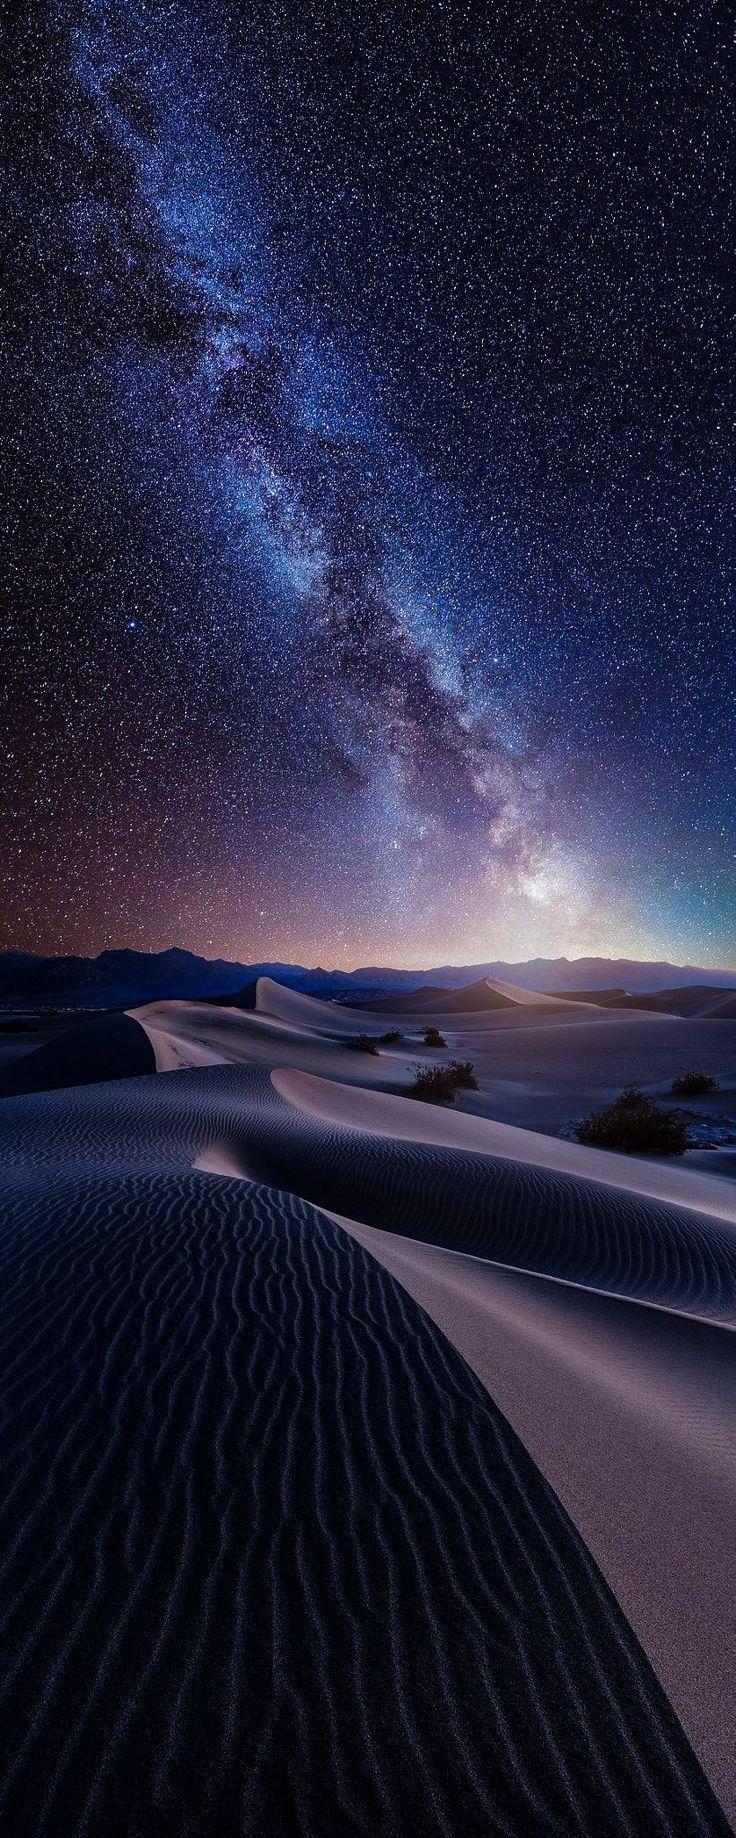 #milkyway #stars #universe #galaxy – Natur